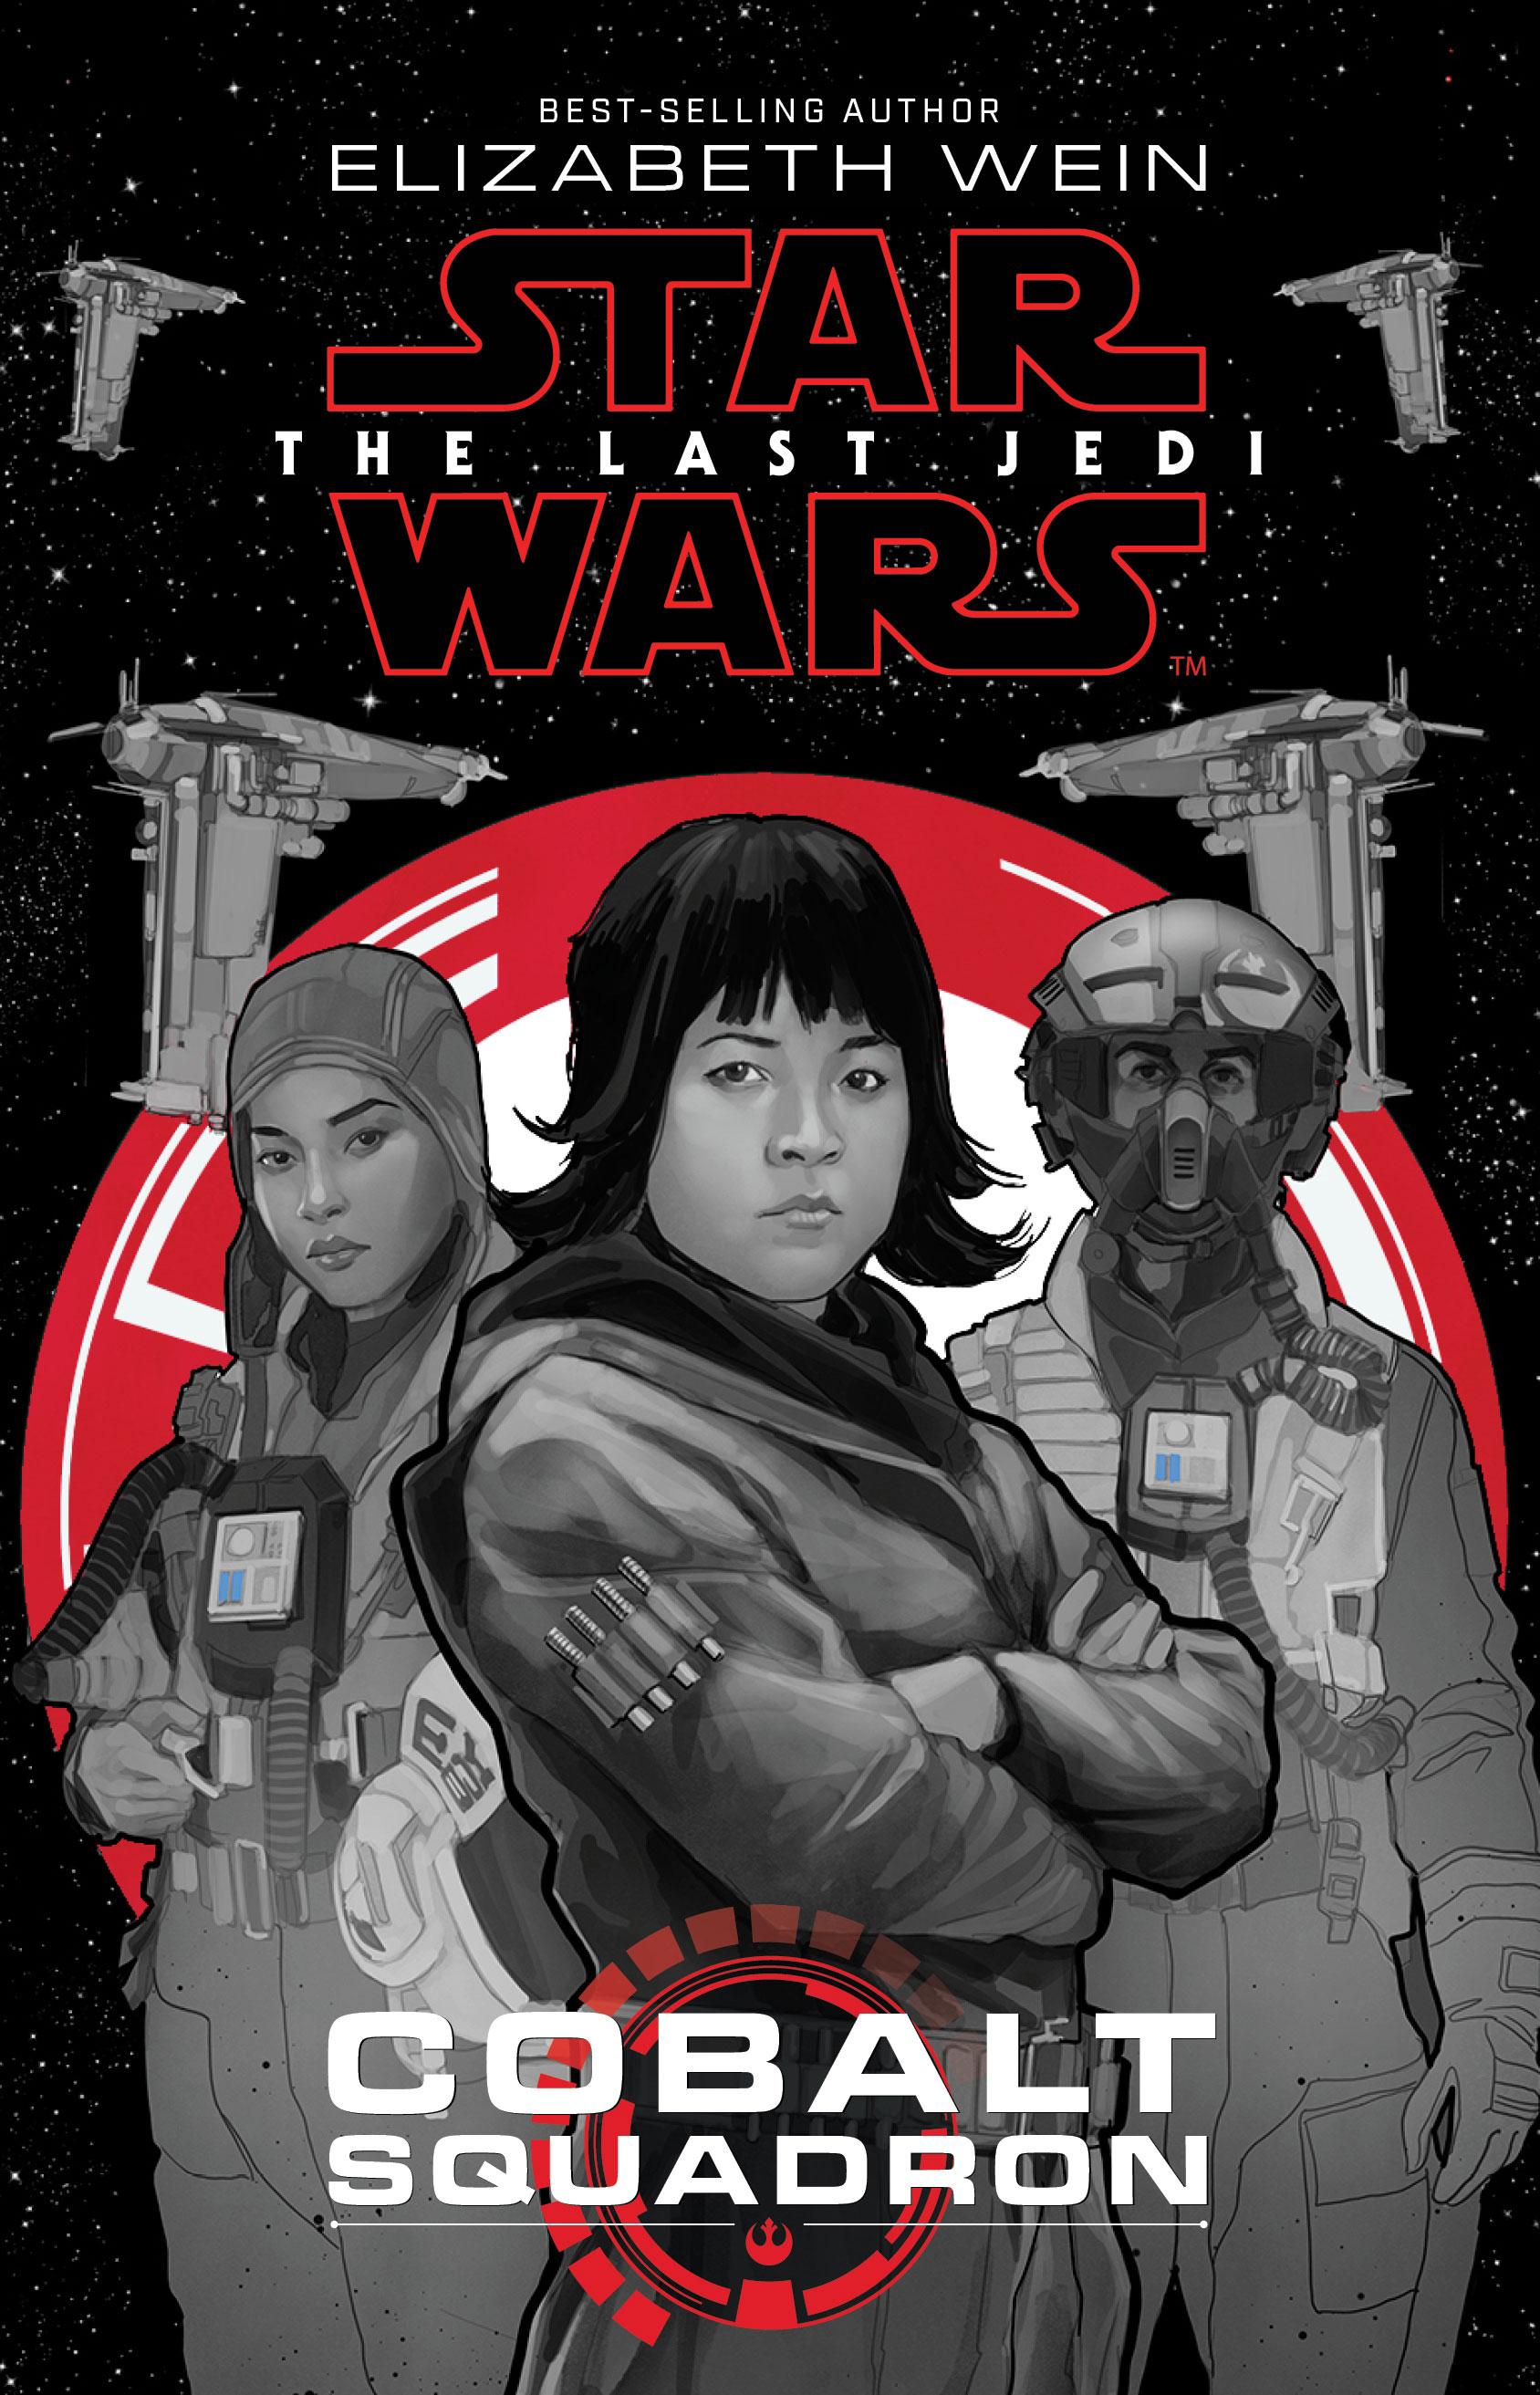 Star Wars: The Last Jedi: Cobalt Squadron